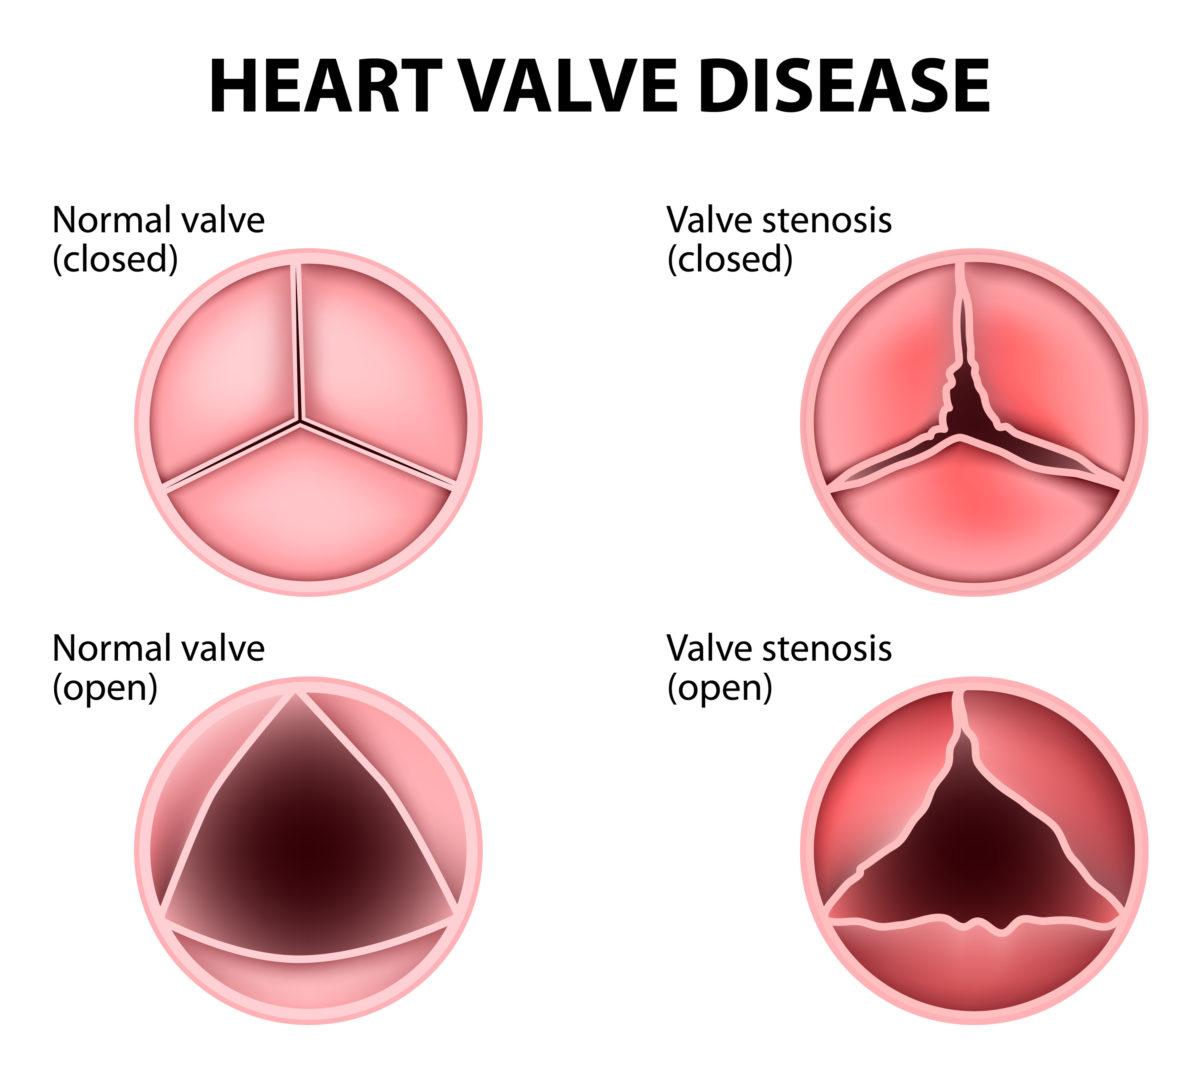 Heart-Valve-Disease-allevi blog.jpg